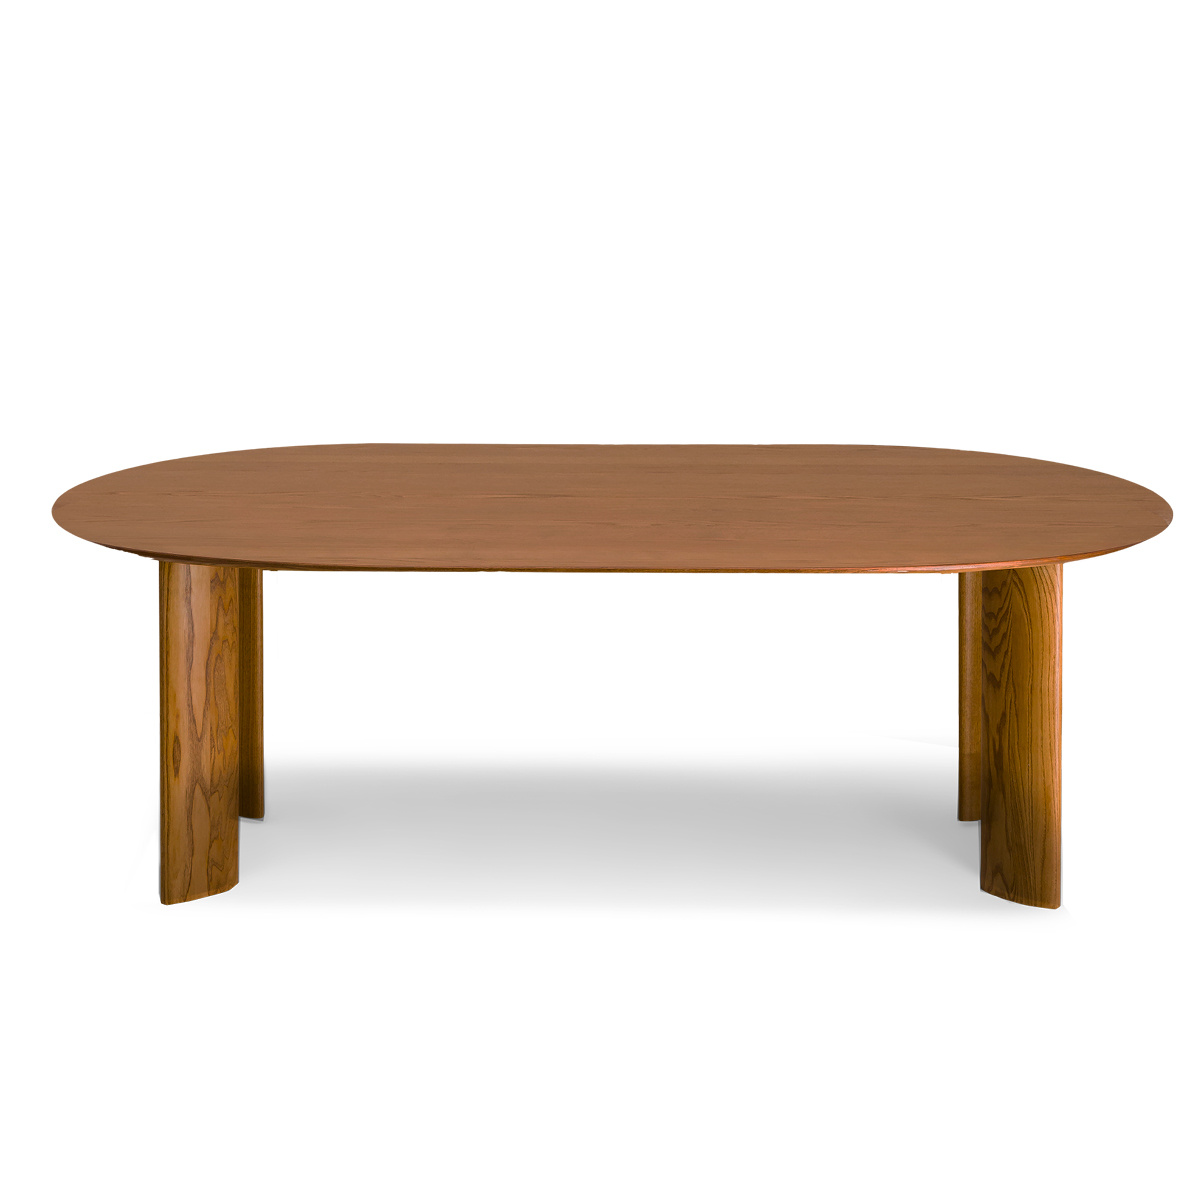 Carlotta Alta Oval Dining Table - 8 seats